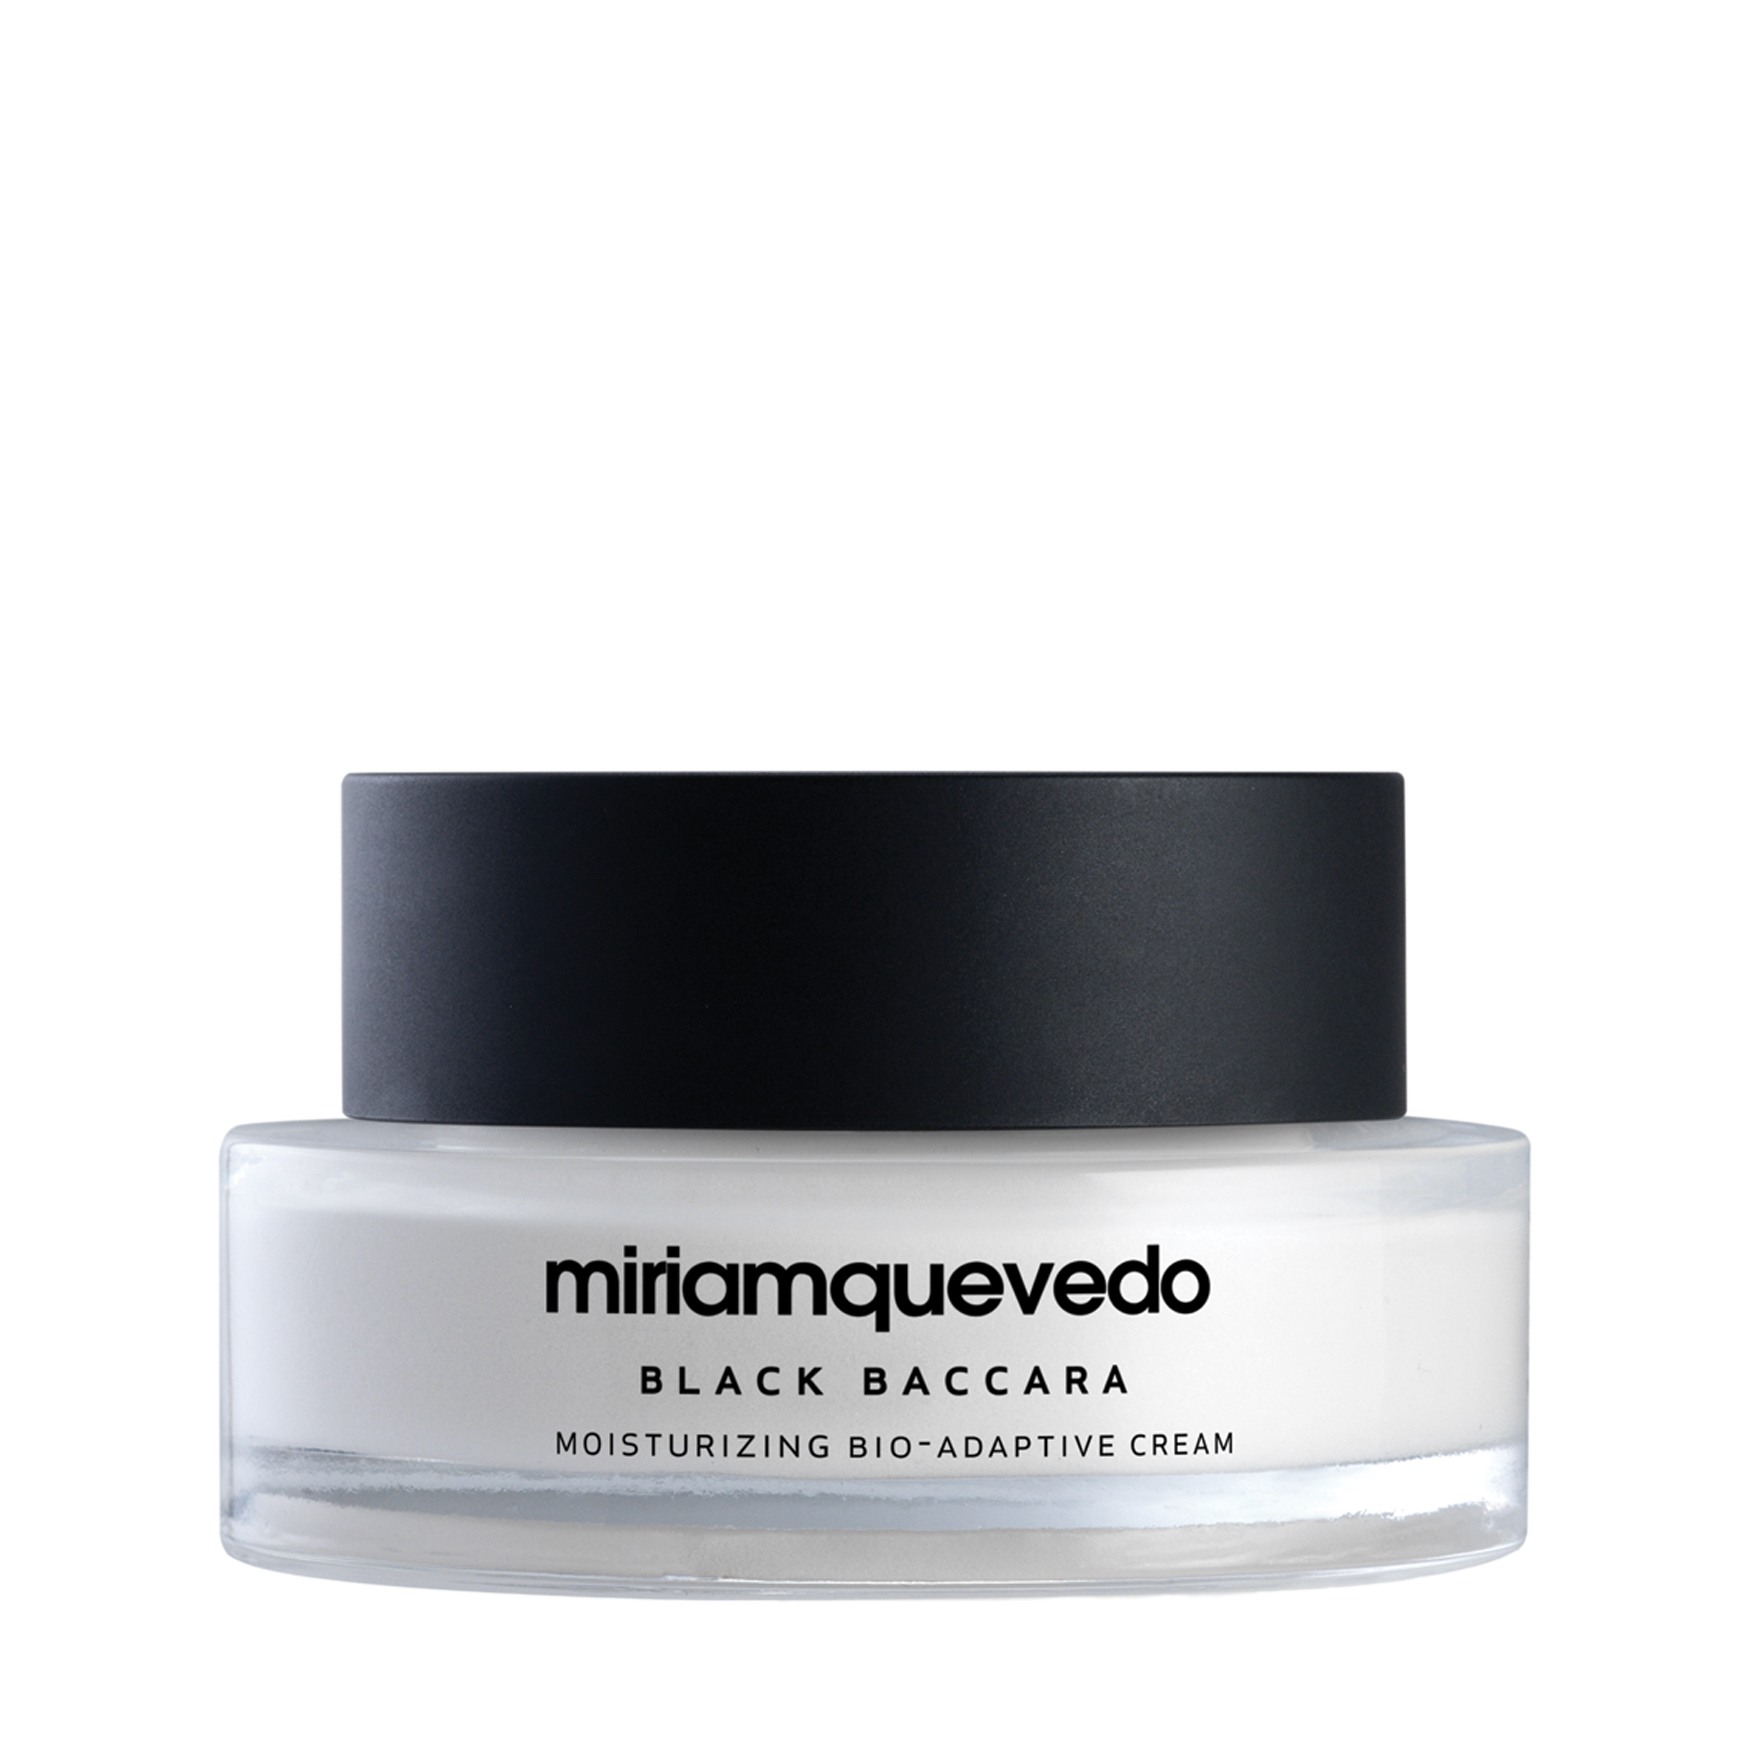 Miriam Quevedo Black Baccara Moisturizing Bio-Adaptive Cream - Space.NK -  USD